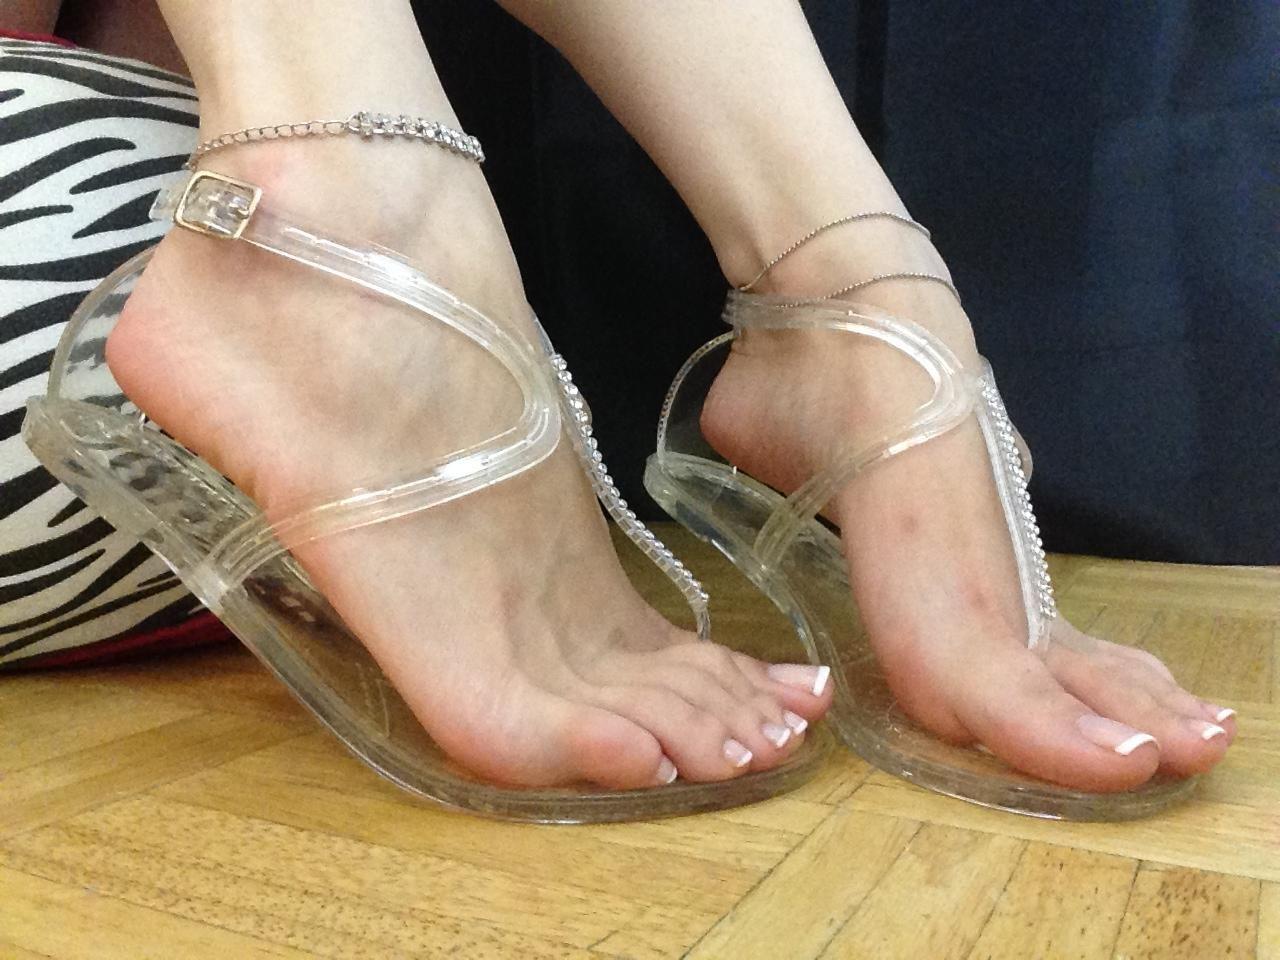 Candid Latina Feet Sandals